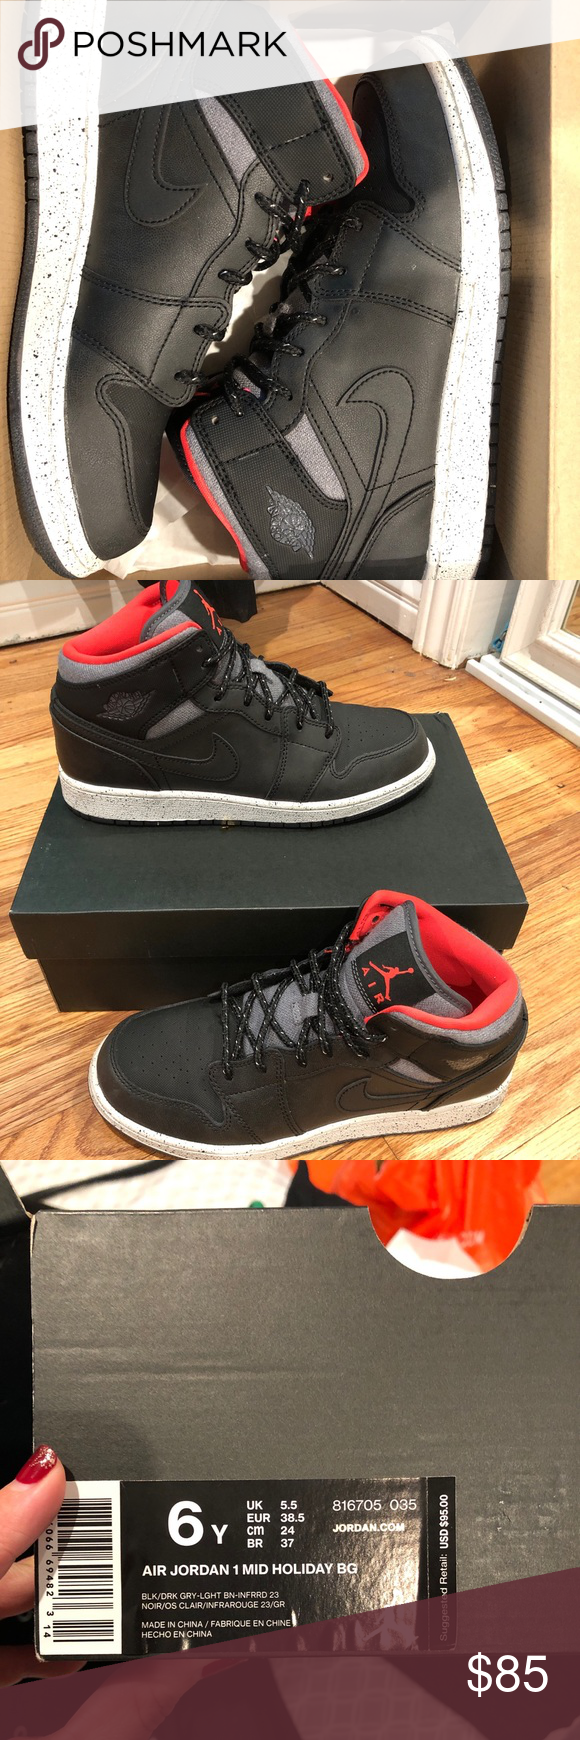 hot sales d8b63 a1c52 Air Jordan 1 Mid Holiday BG   Women   Youth Shoes Brand New Air Jordans 1